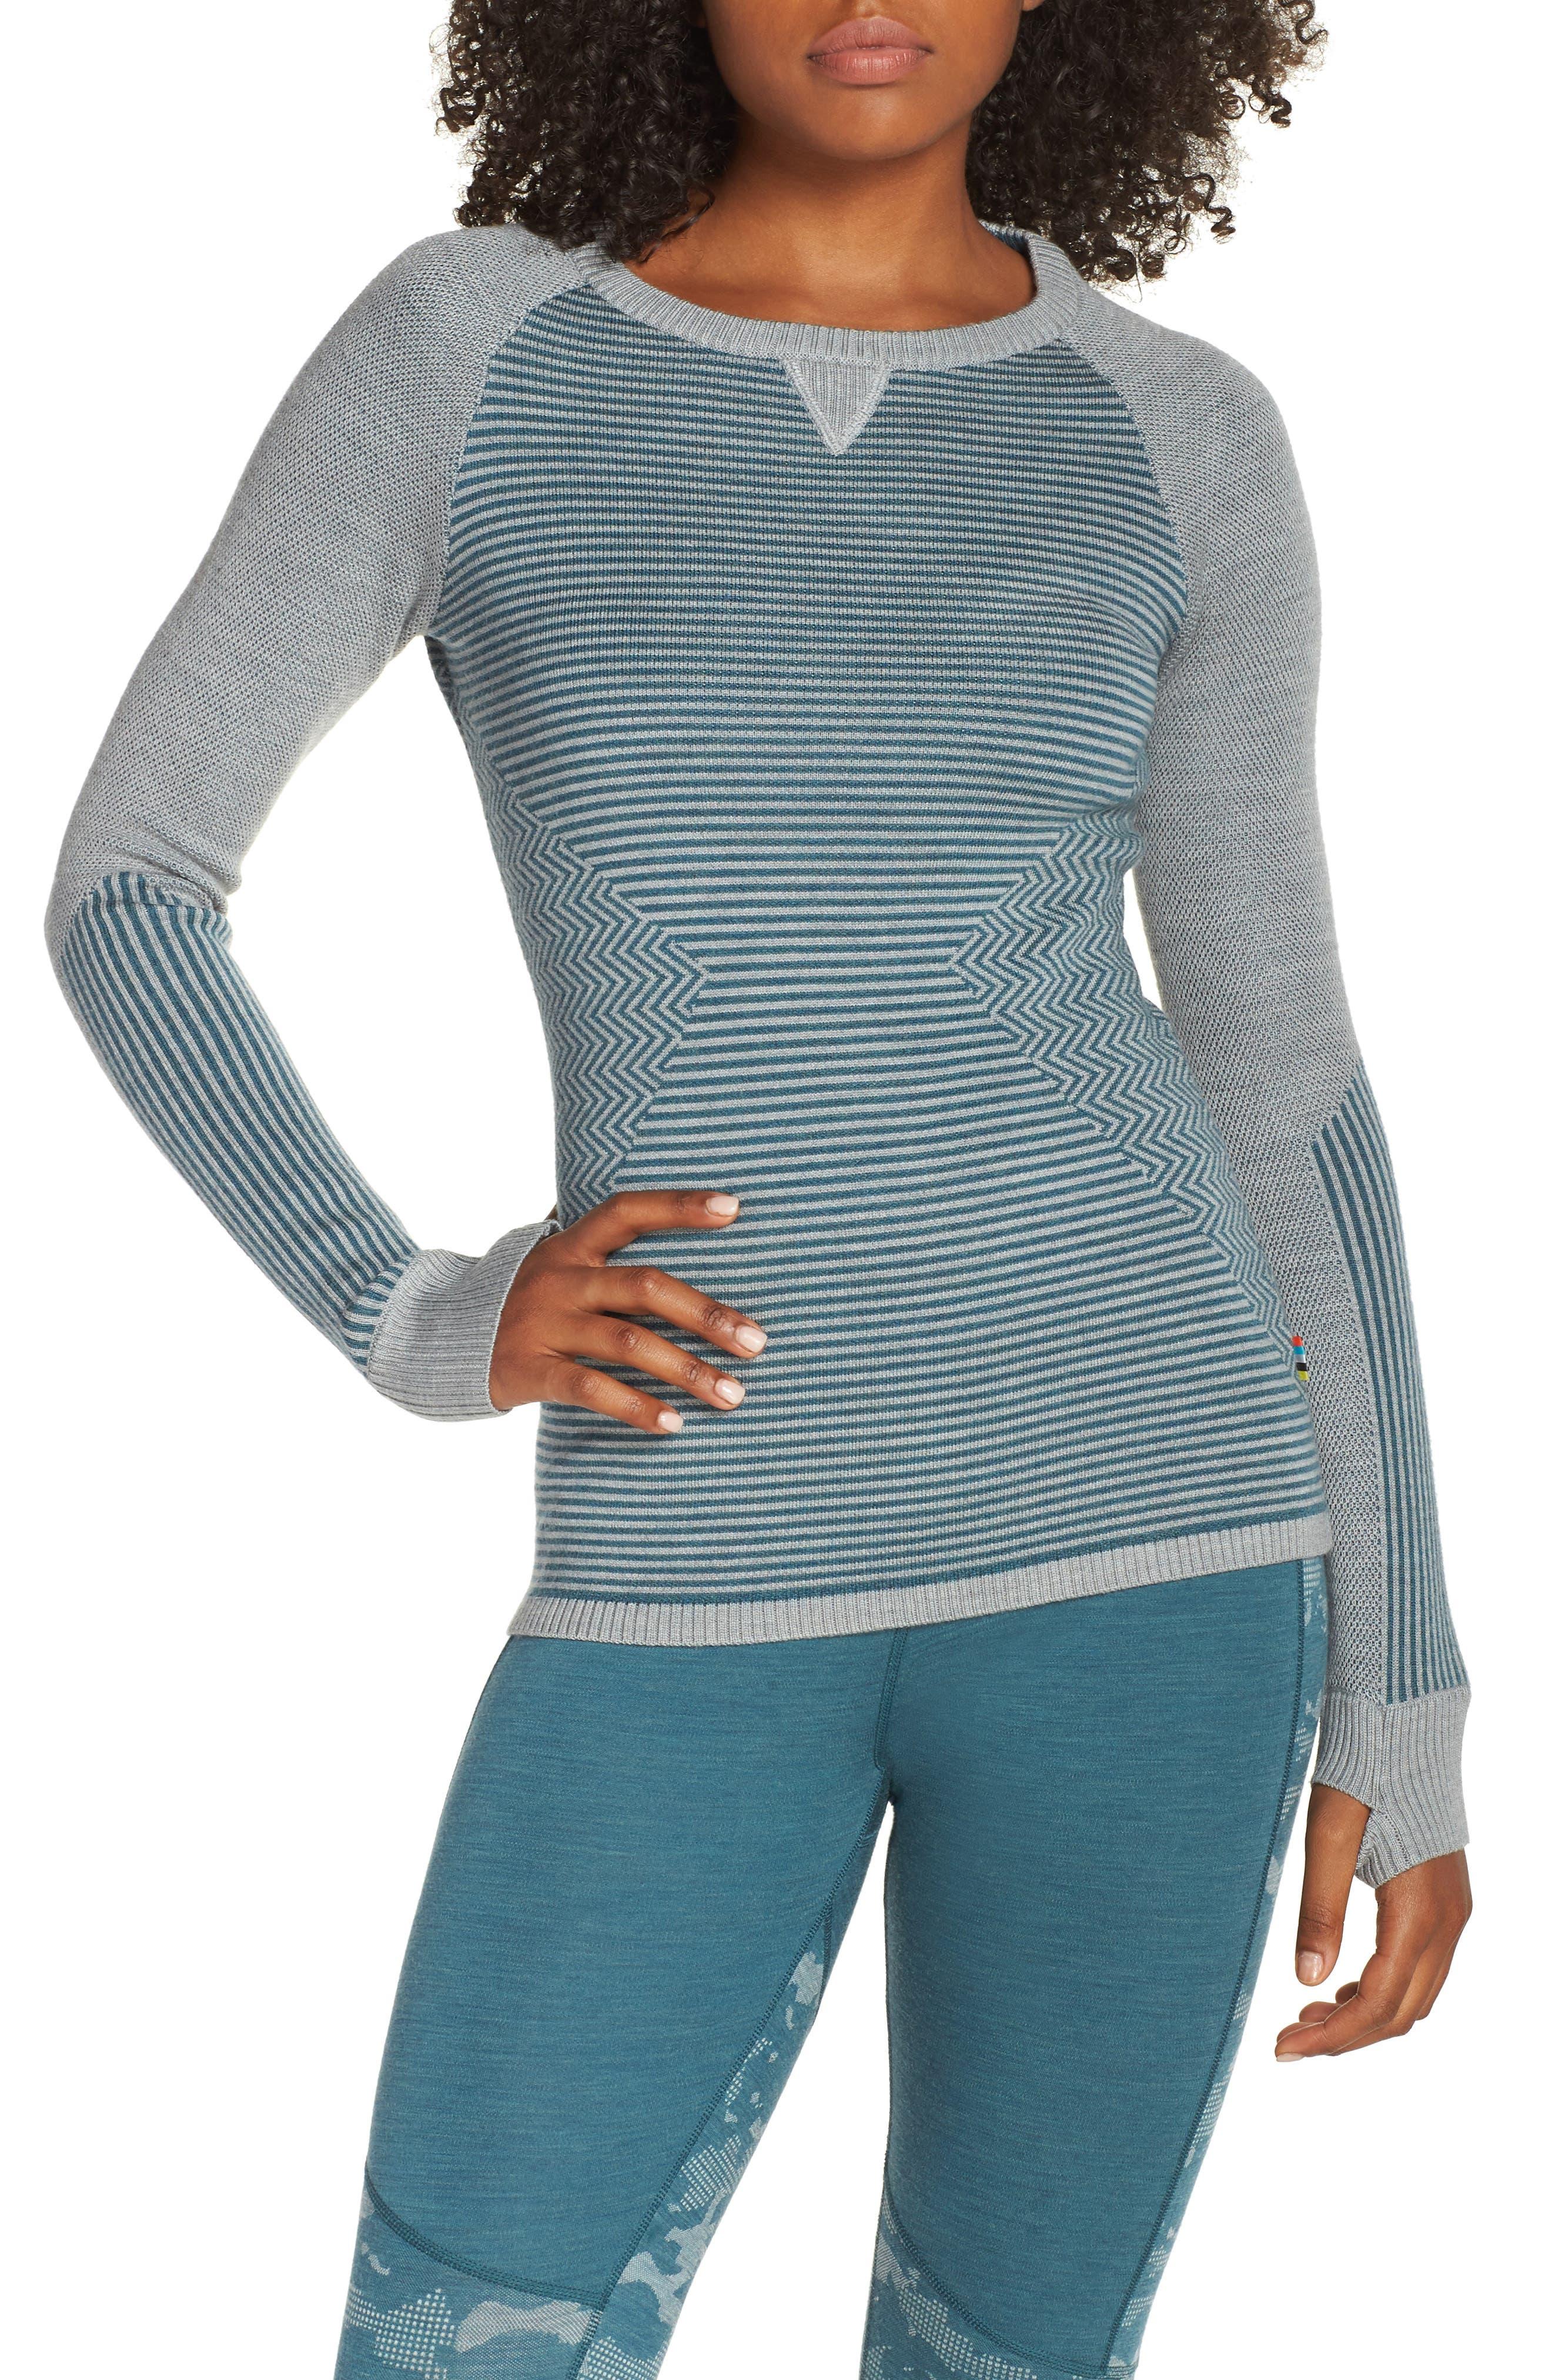 SMARTWOOL,                             Dacono Ski Sweater,                             Main thumbnail 1, color,                             310